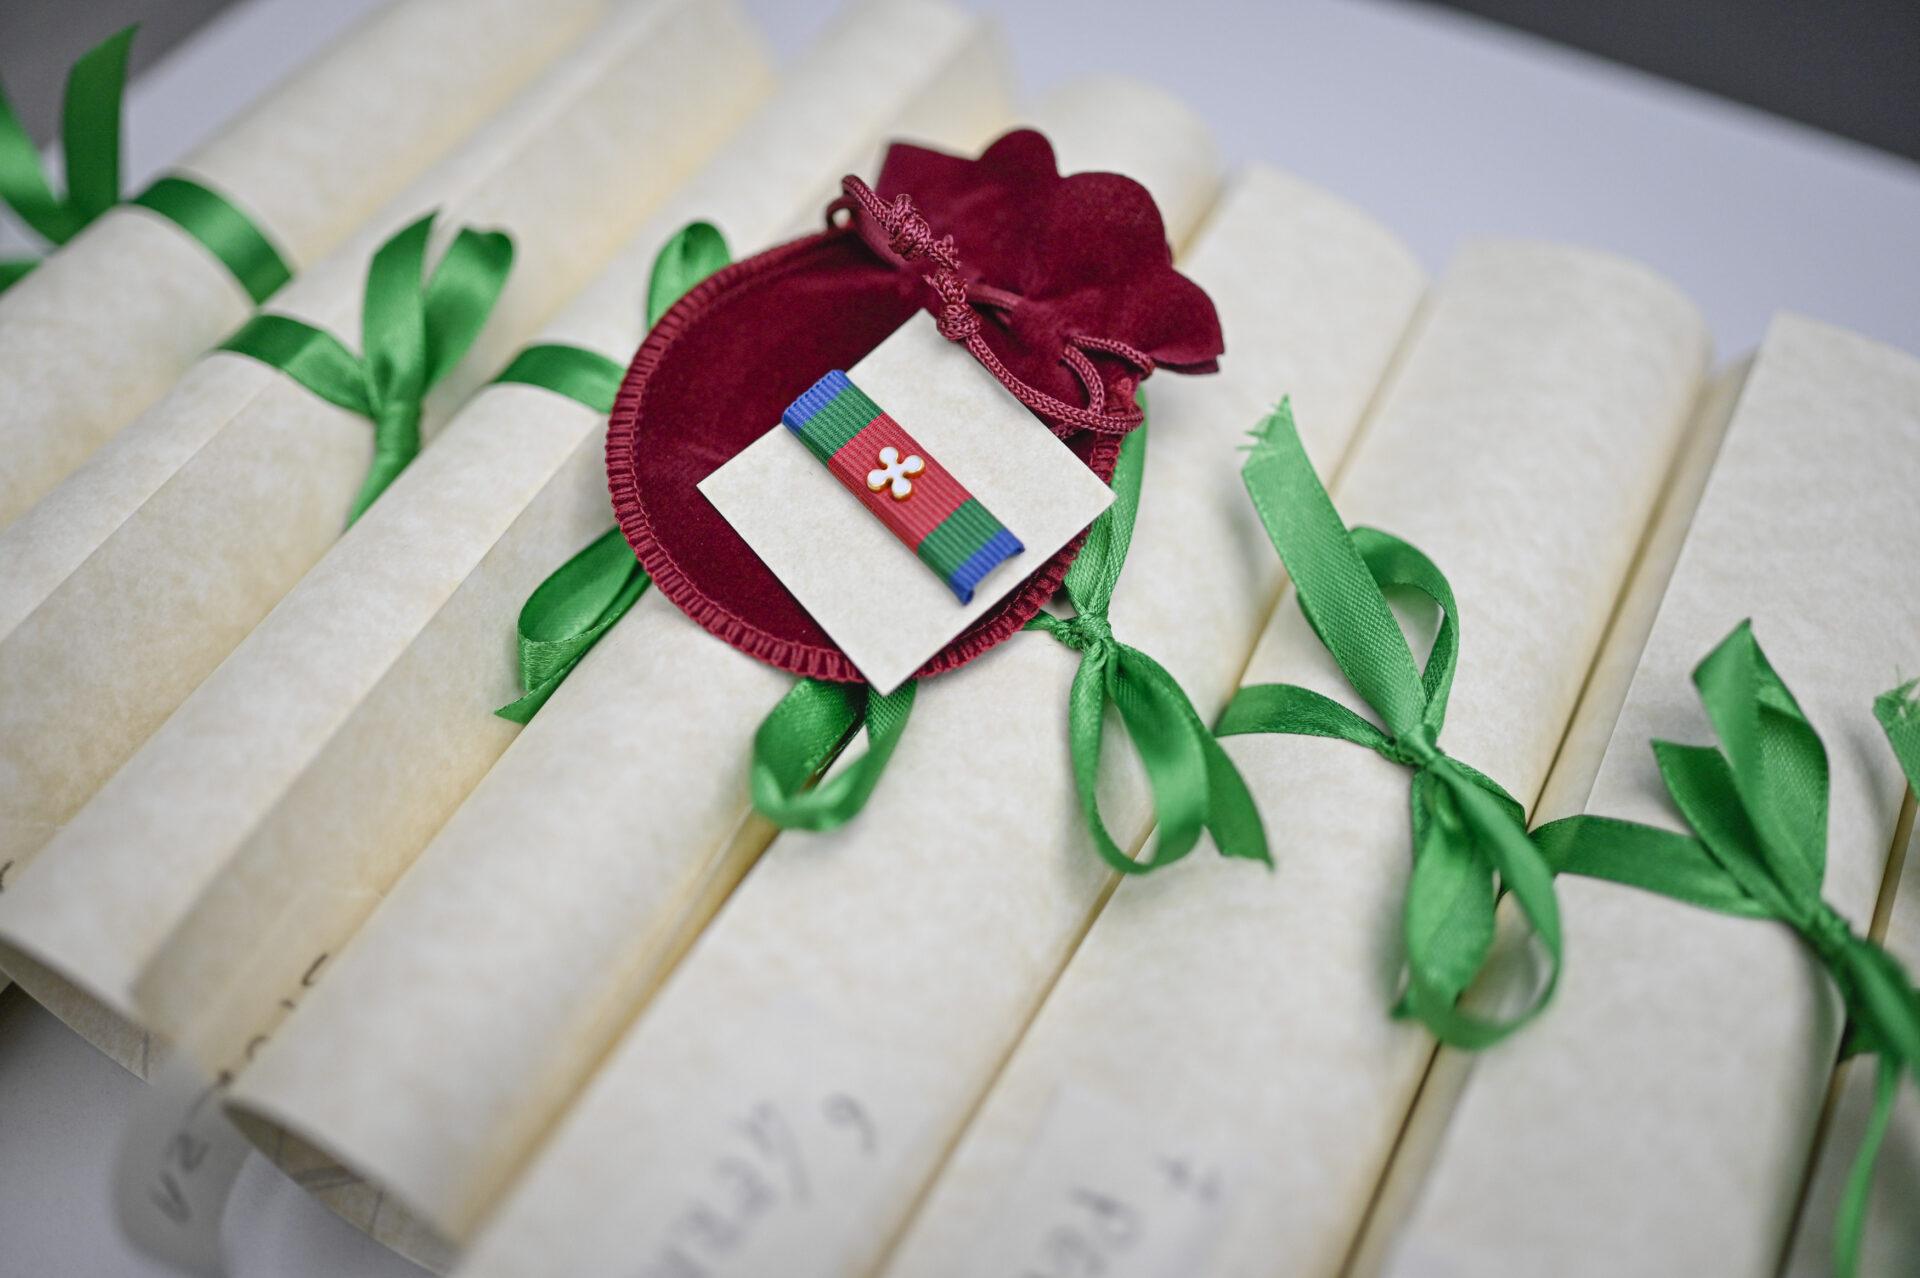 Onorificenze Regione Lombardia